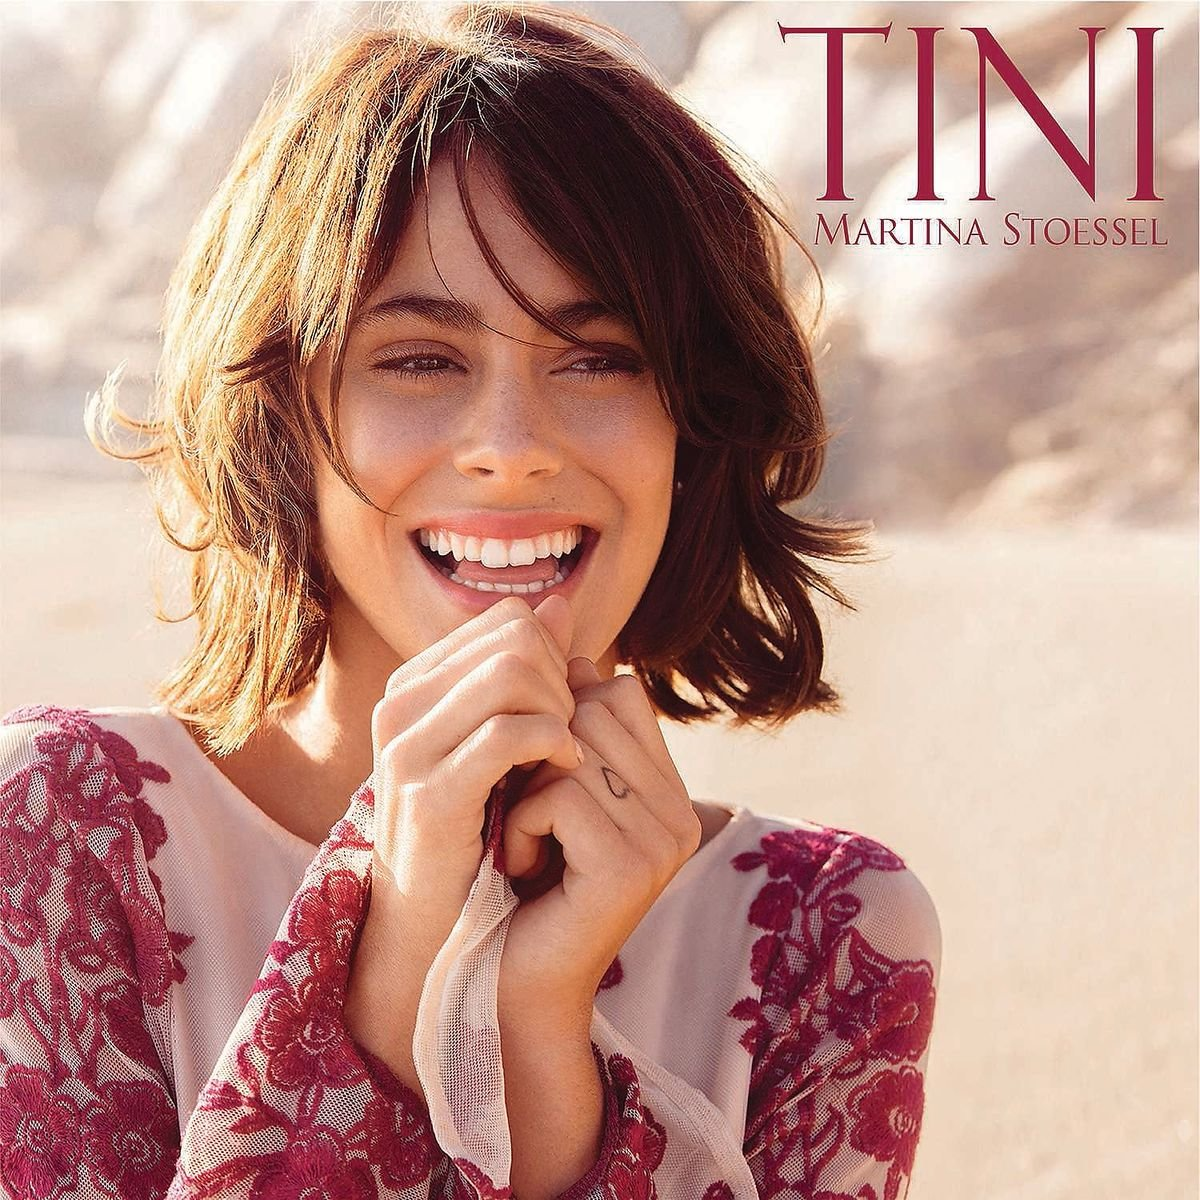 wanneer is martina stoessel jarig bol.| Tini (Martina Stoessel), tINI | CD (album) | Muziek wanneer is martina stoessel jarig